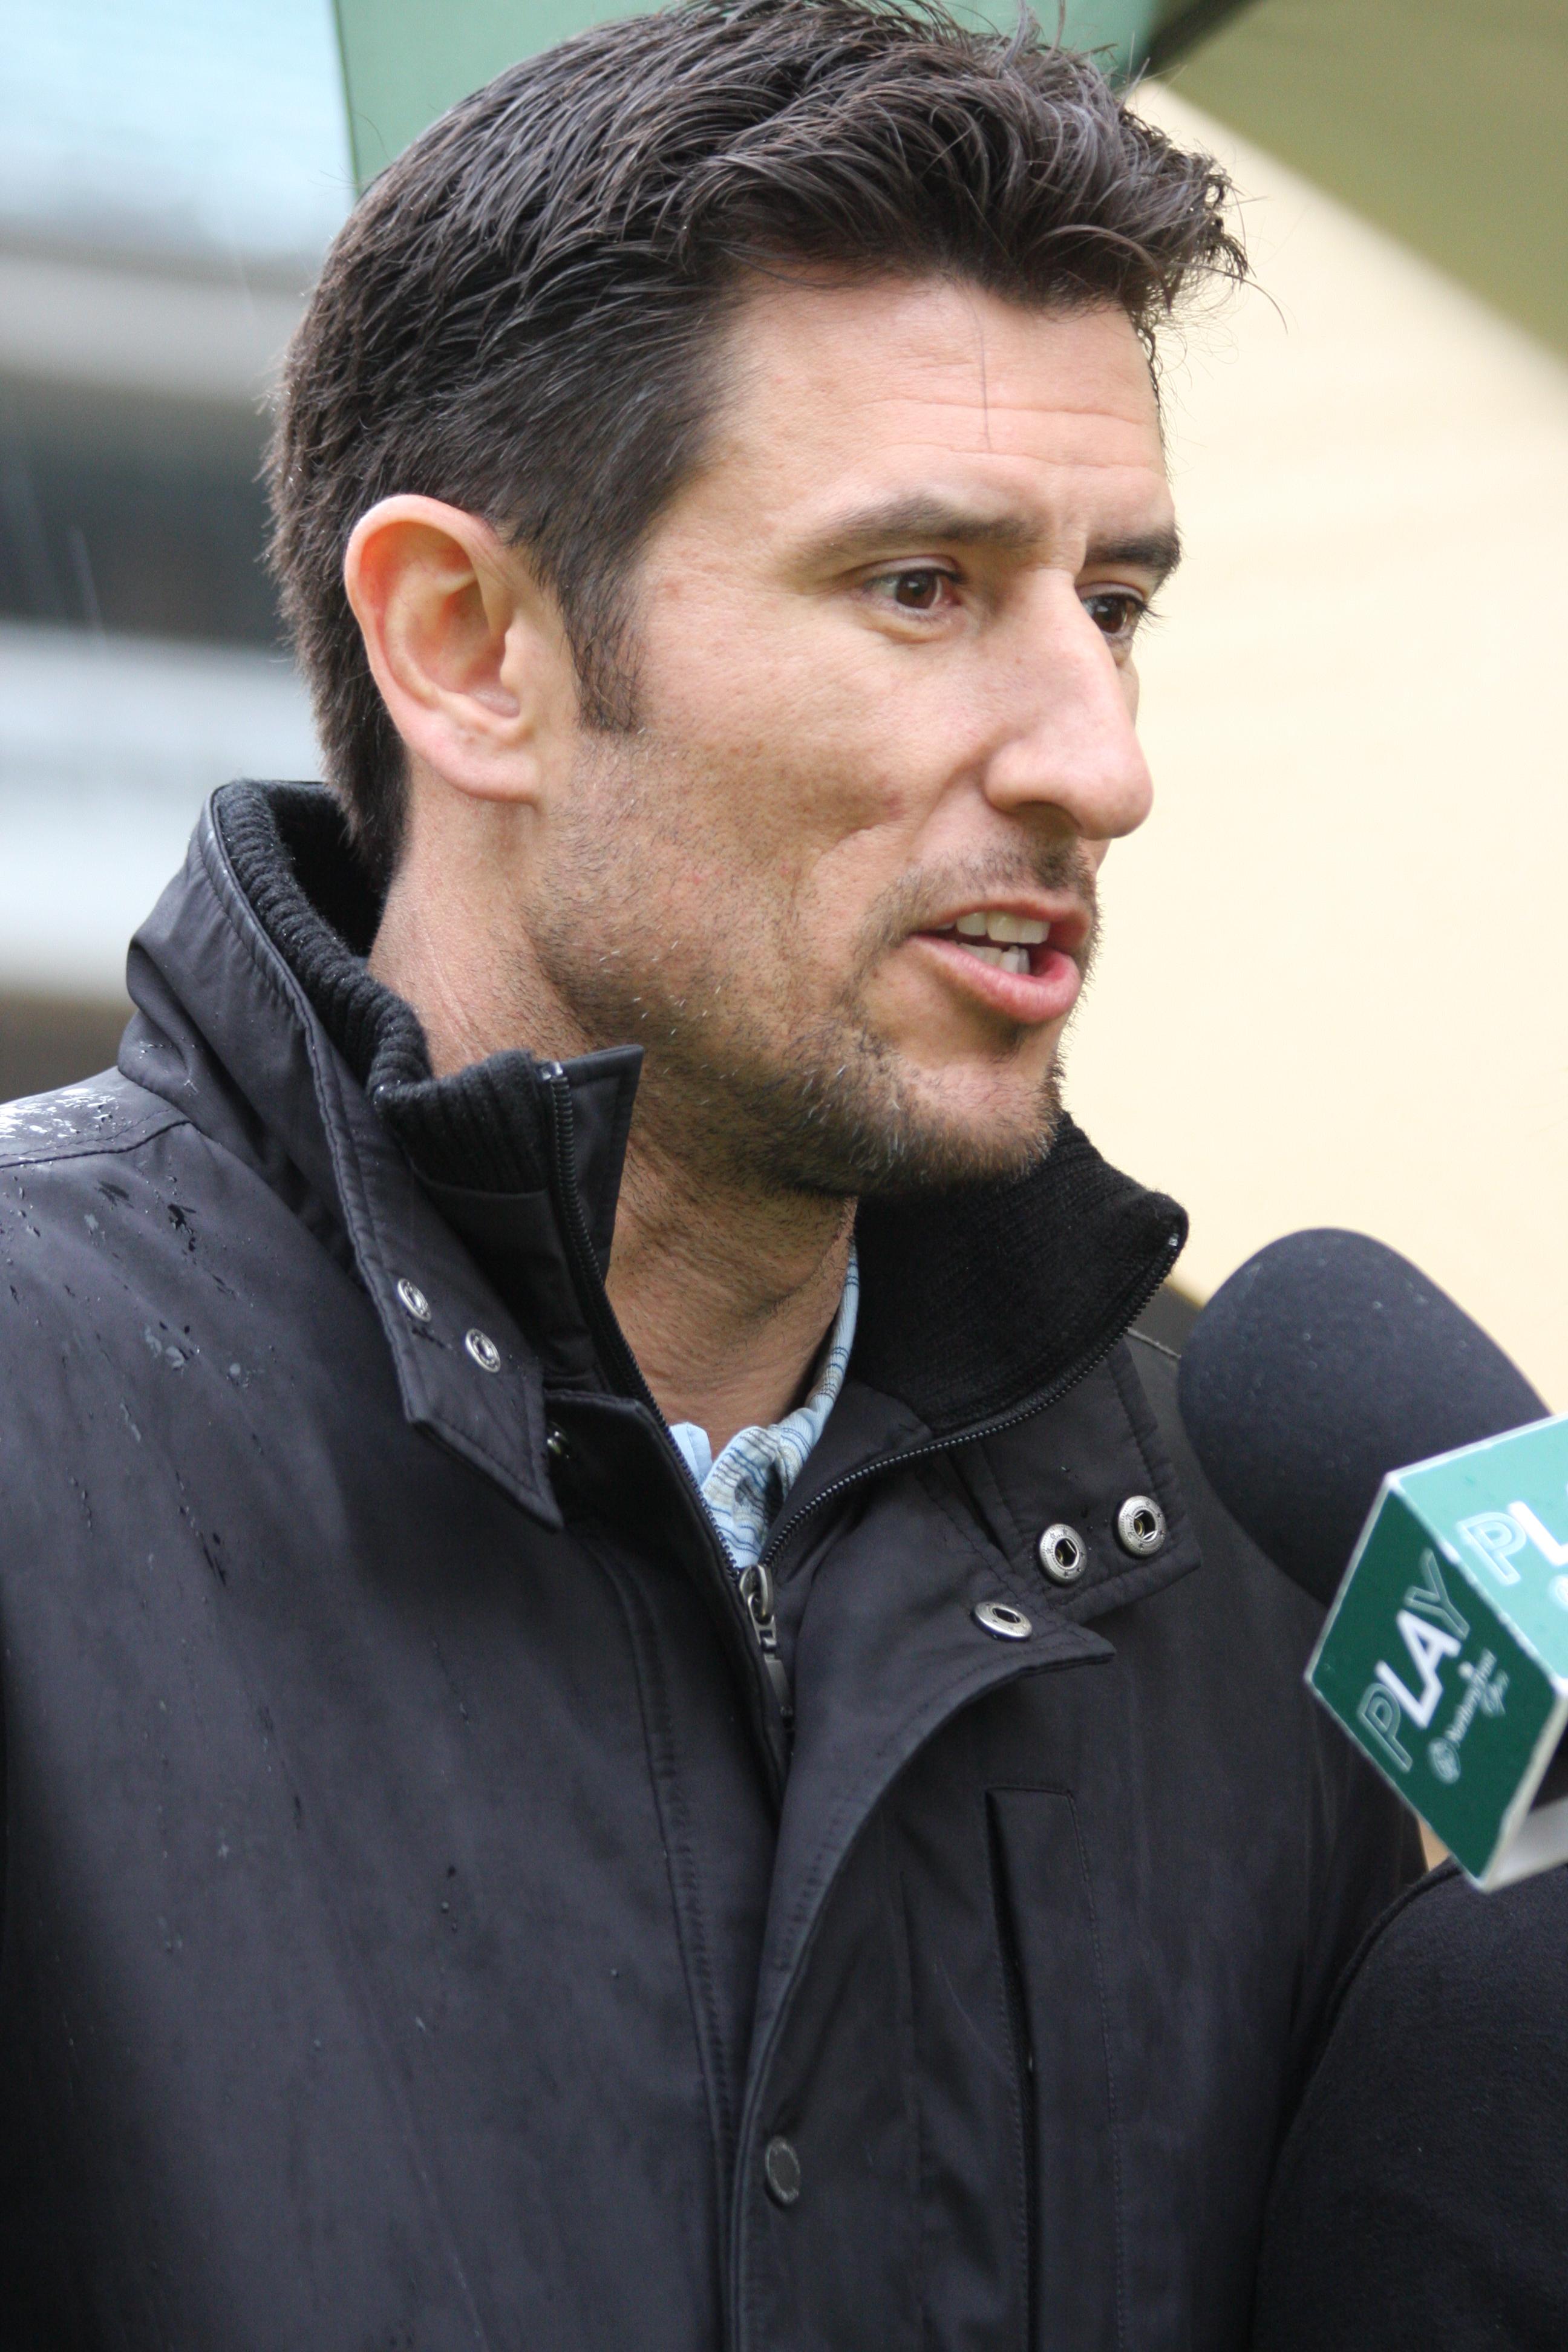 Ramon nomar